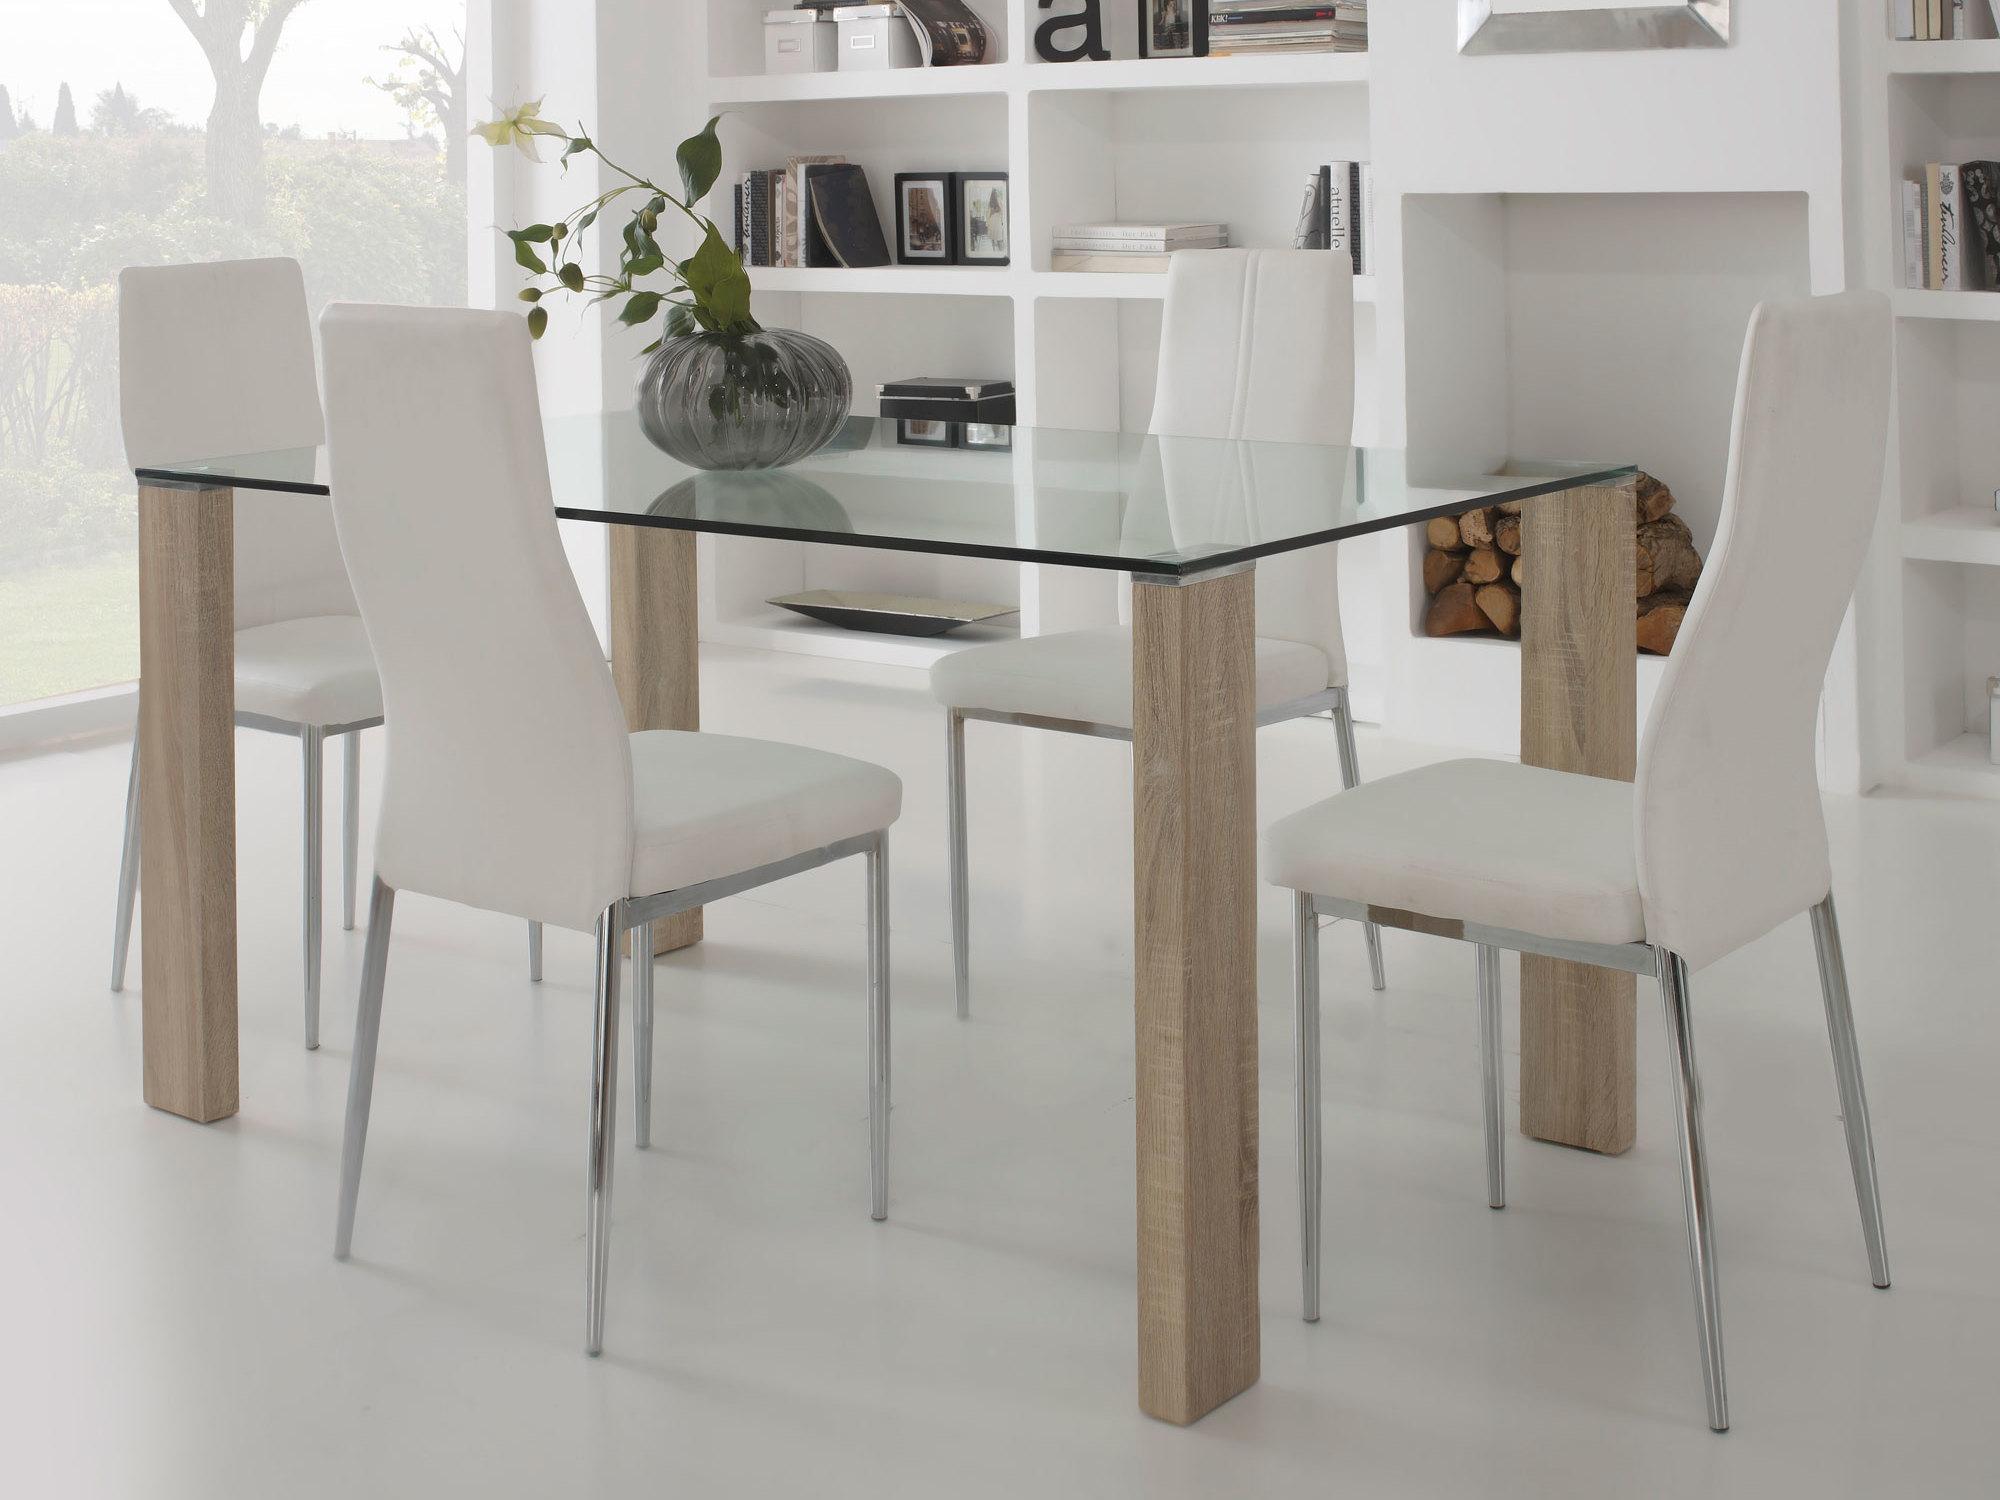 table de cuisine moderne en verre maison. Black Bedroom Furniture Sets. Home Design Ideas